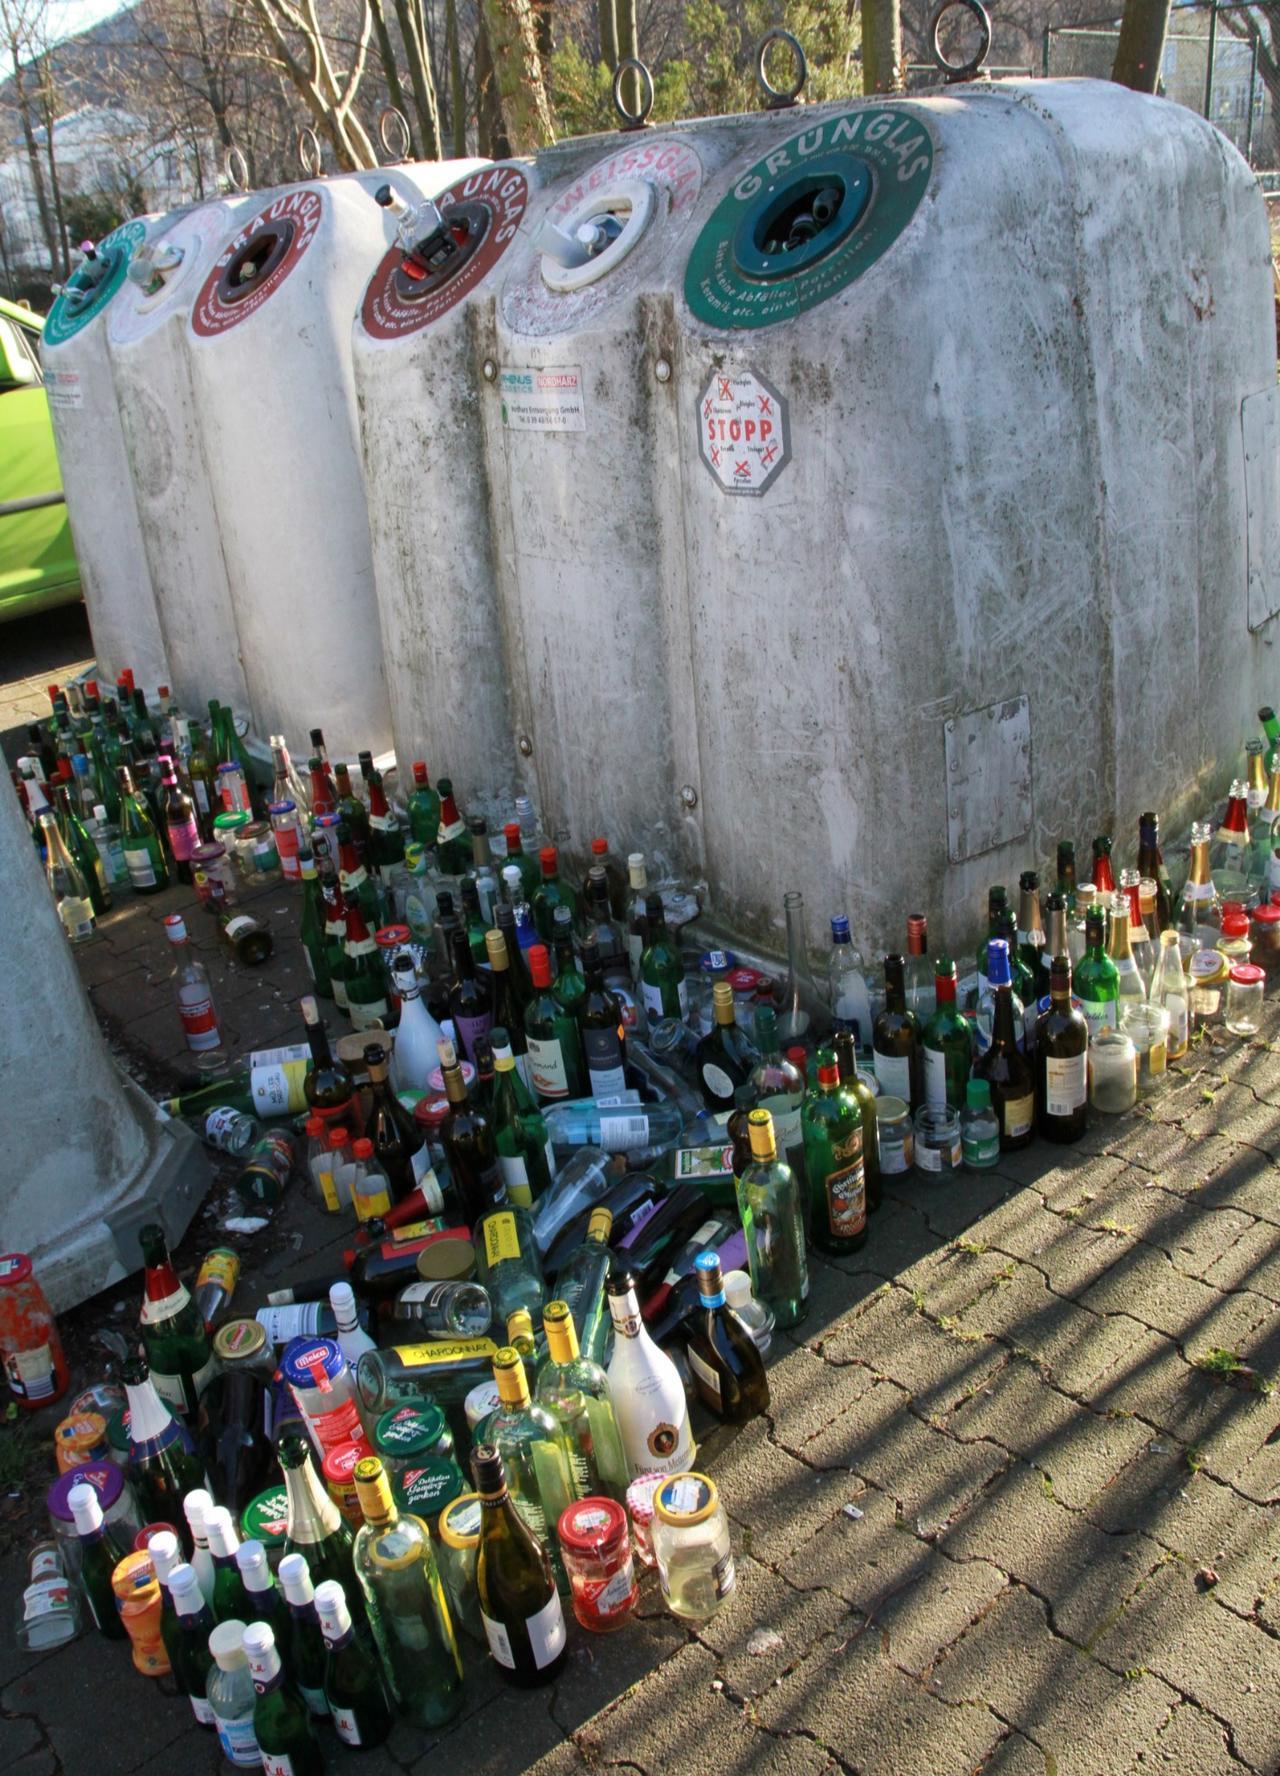 Flasche leer, Container voll